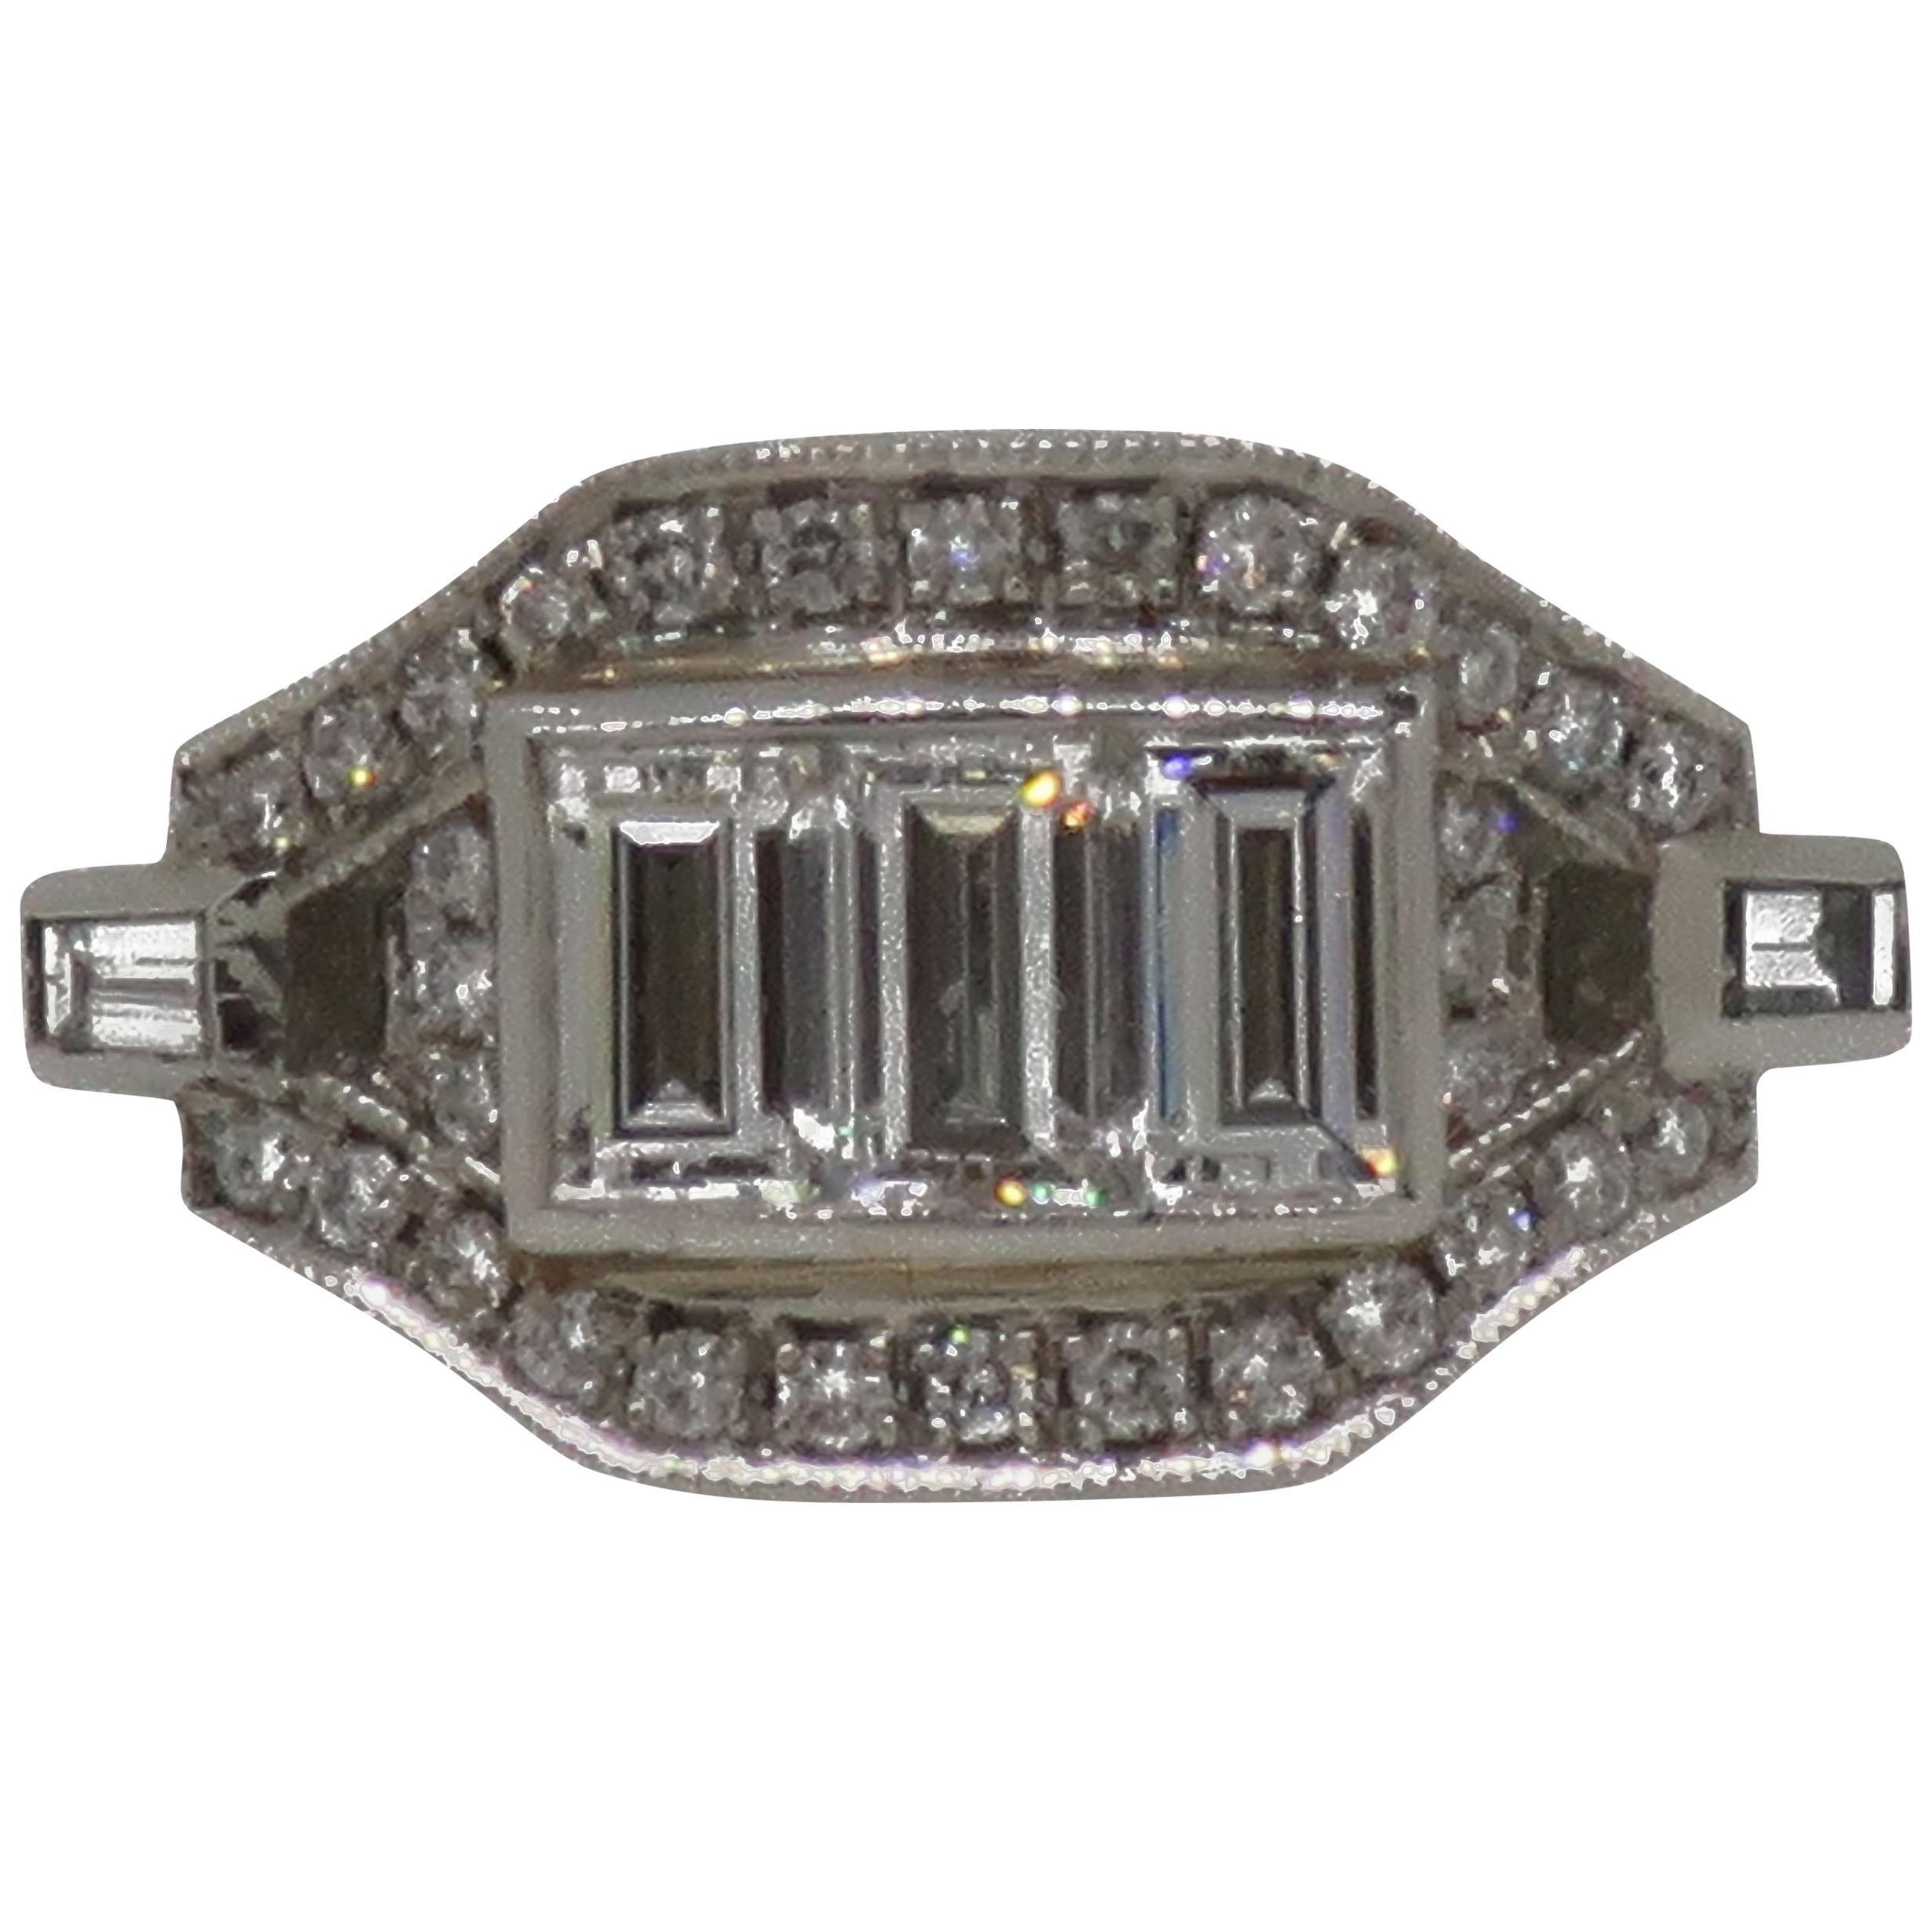 Platinum Baguette Cut Diamond Art Deco Style Cluster Ring